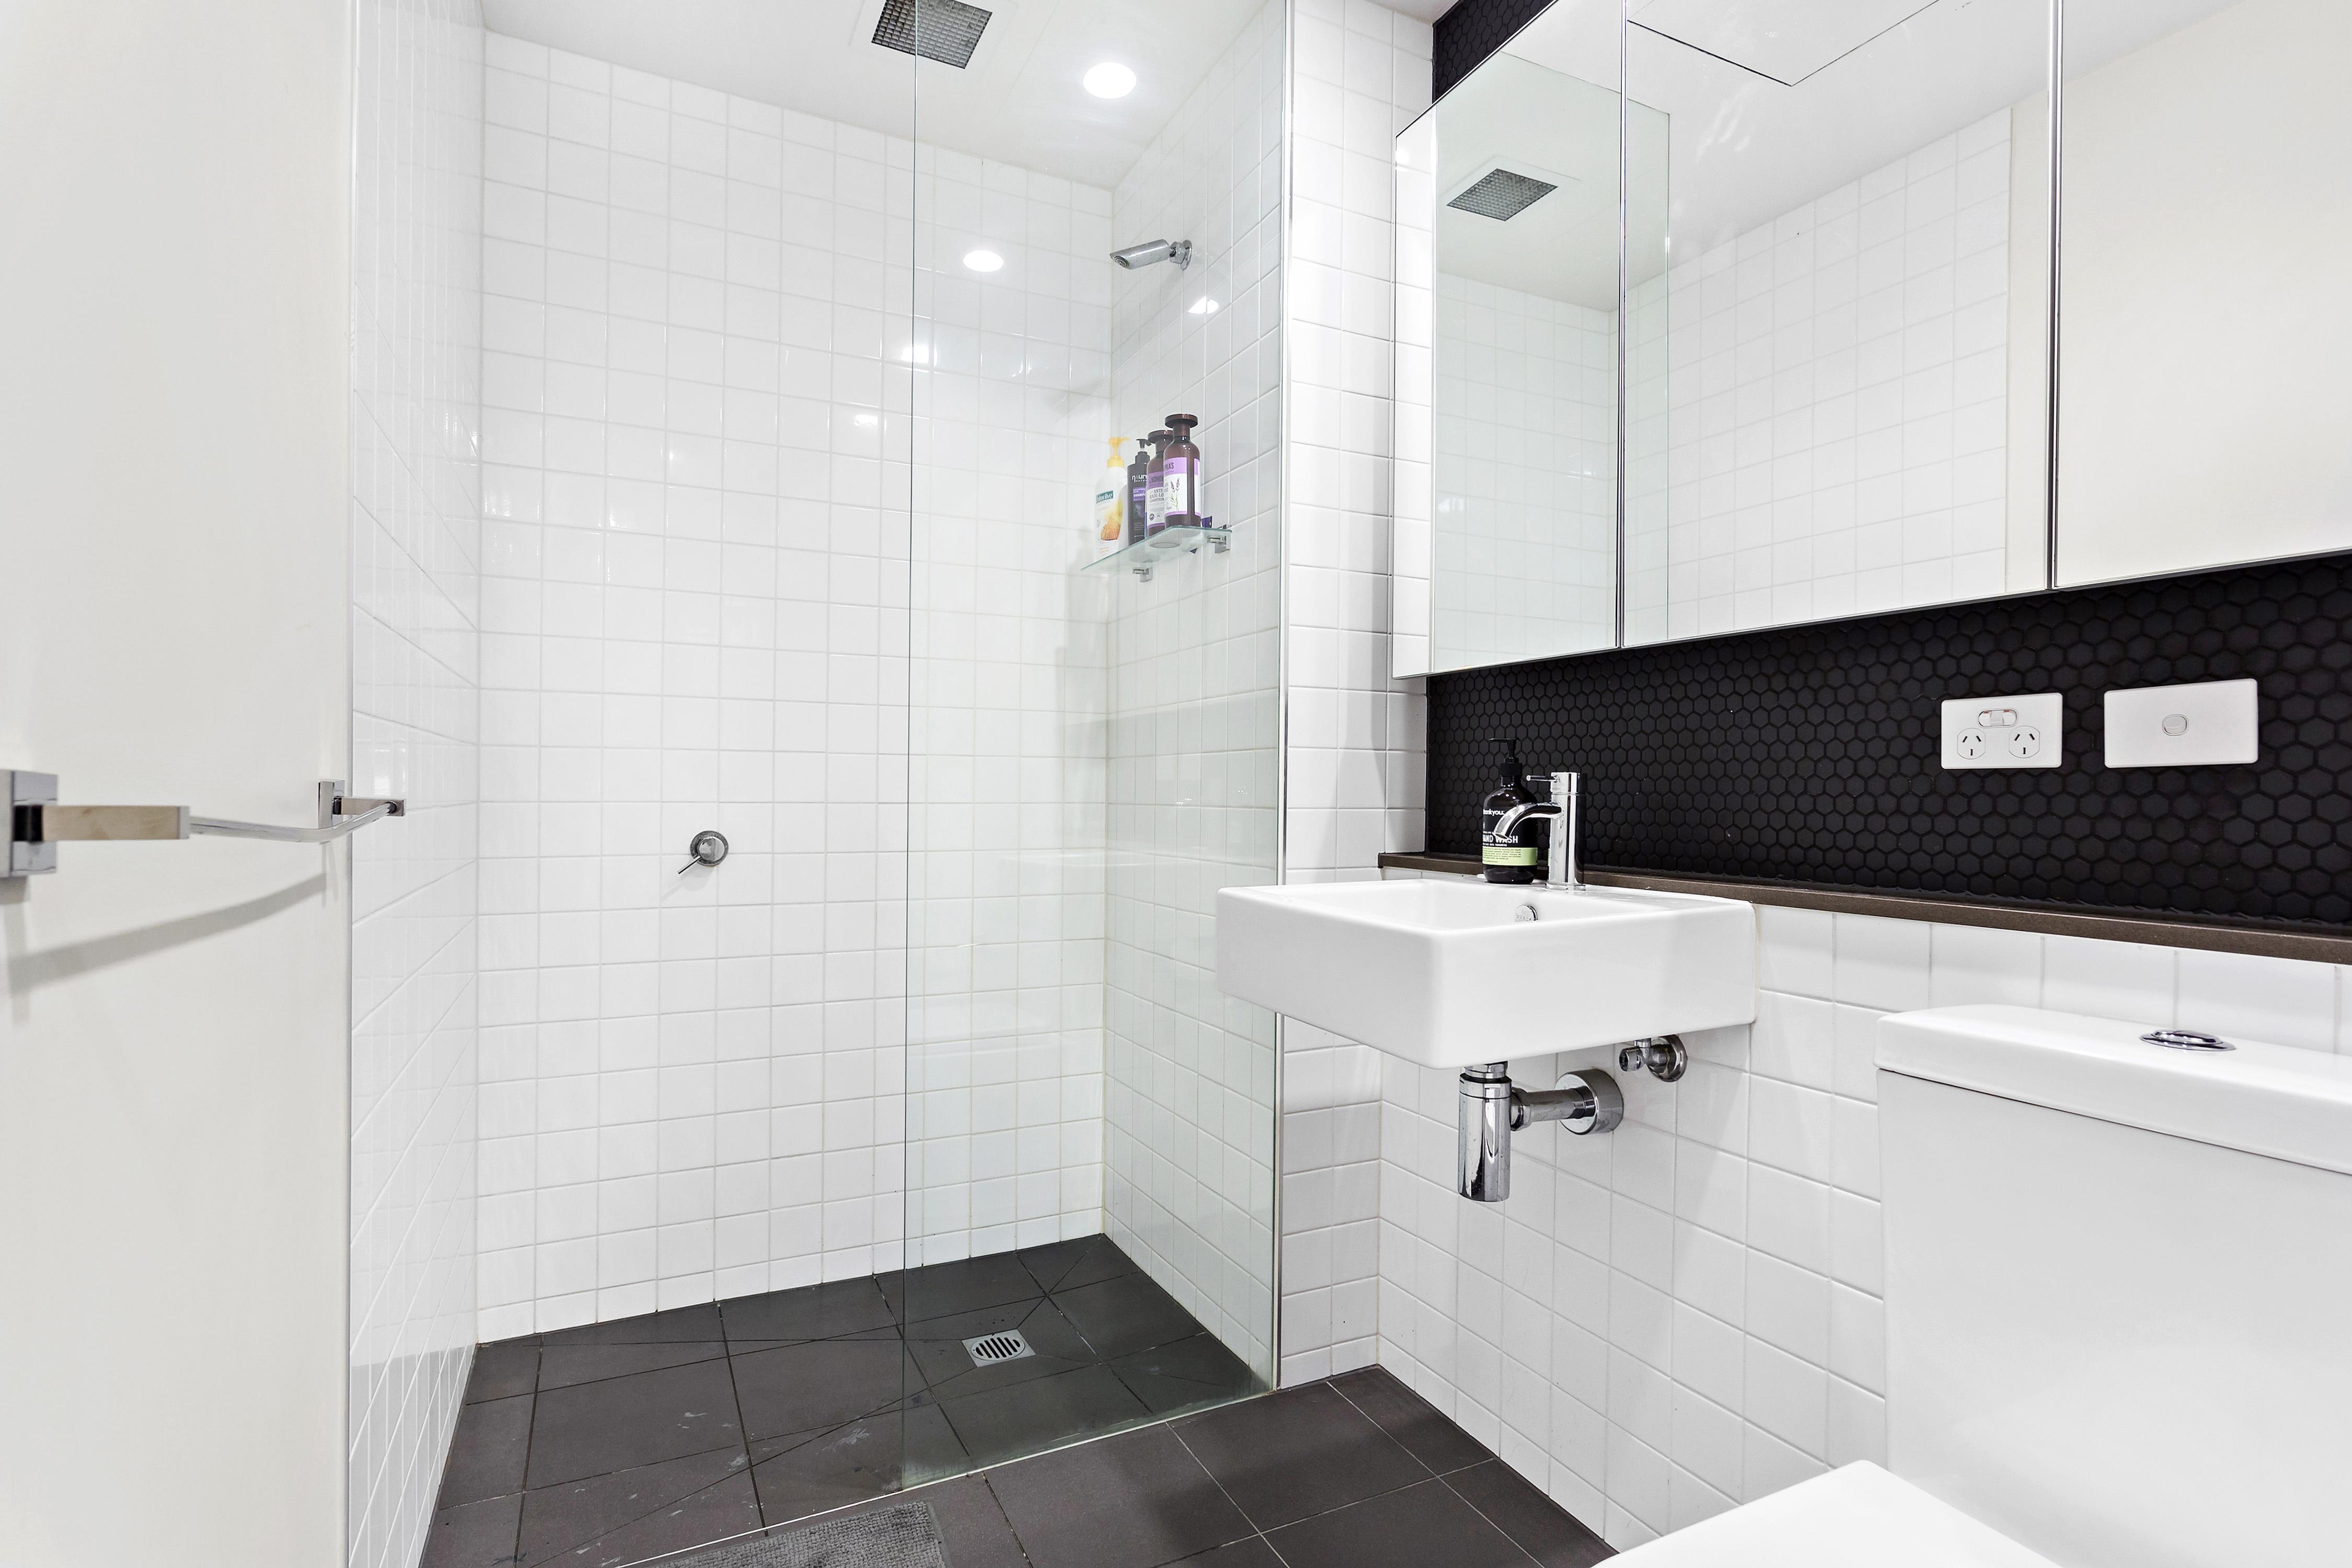 108-97-flemington-road-north-melbourne-student-accommodation-Melbourne-Bathroom-1-Unilodgers